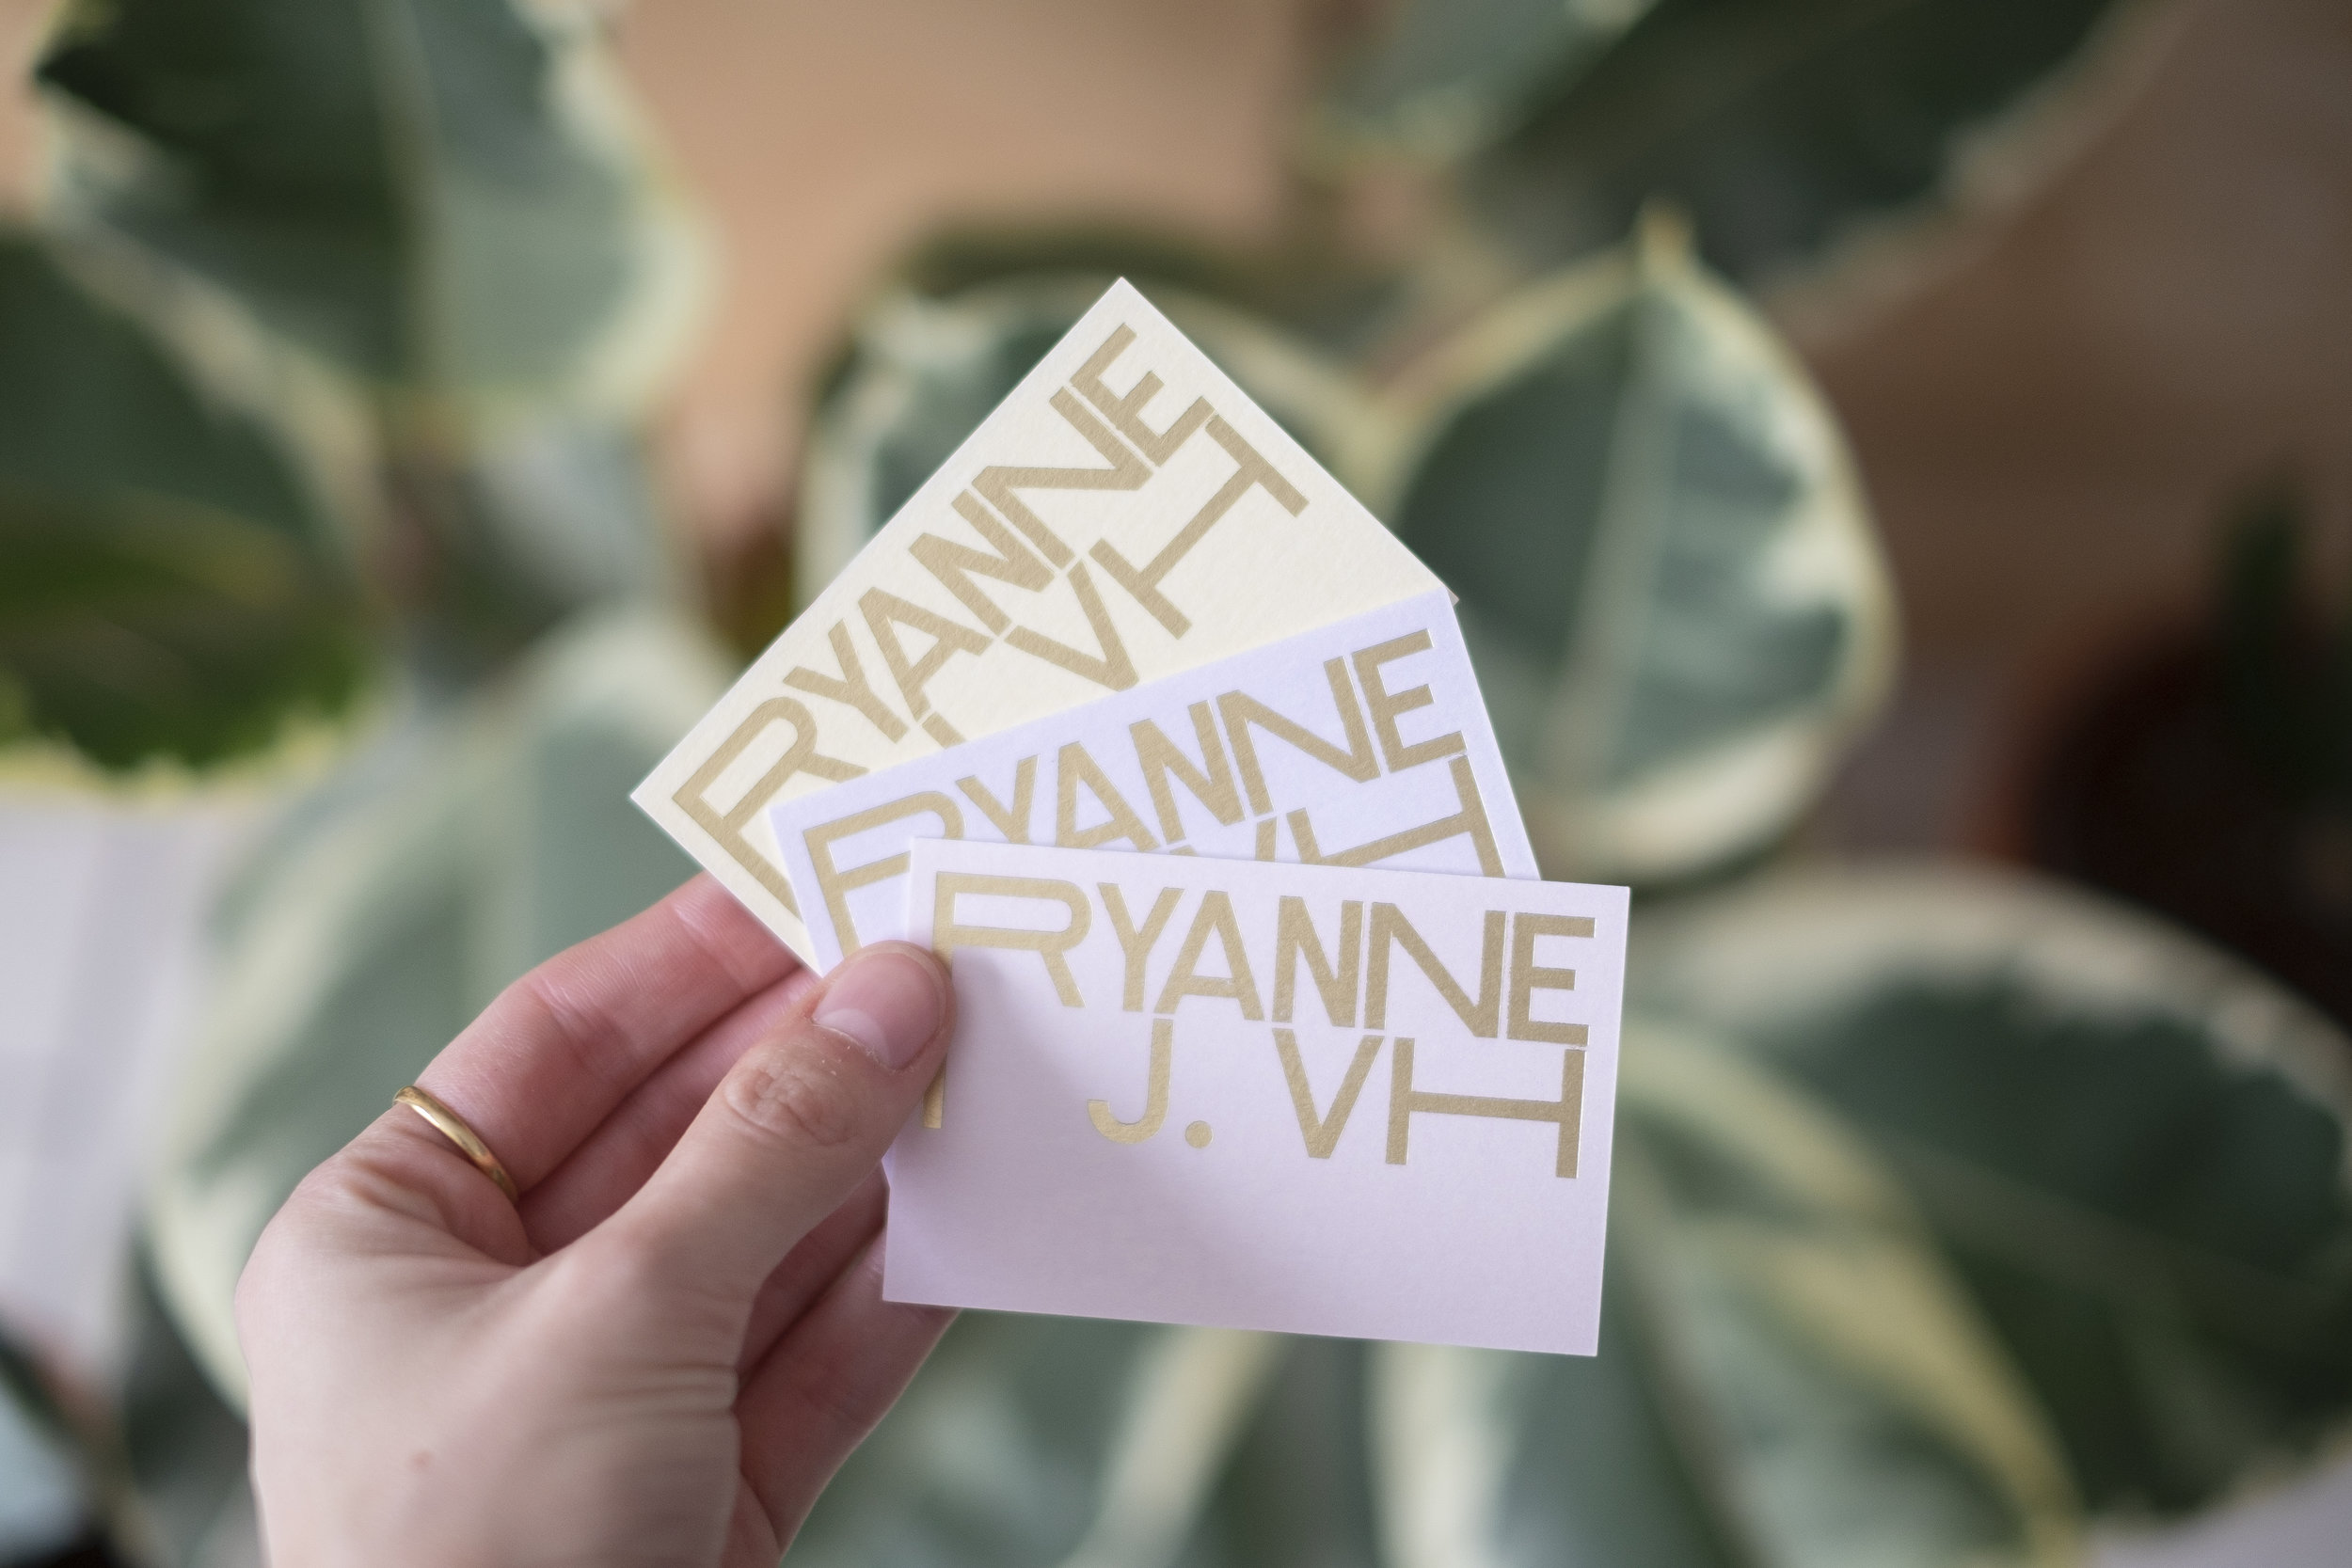 Ryanne J.VH - More logos